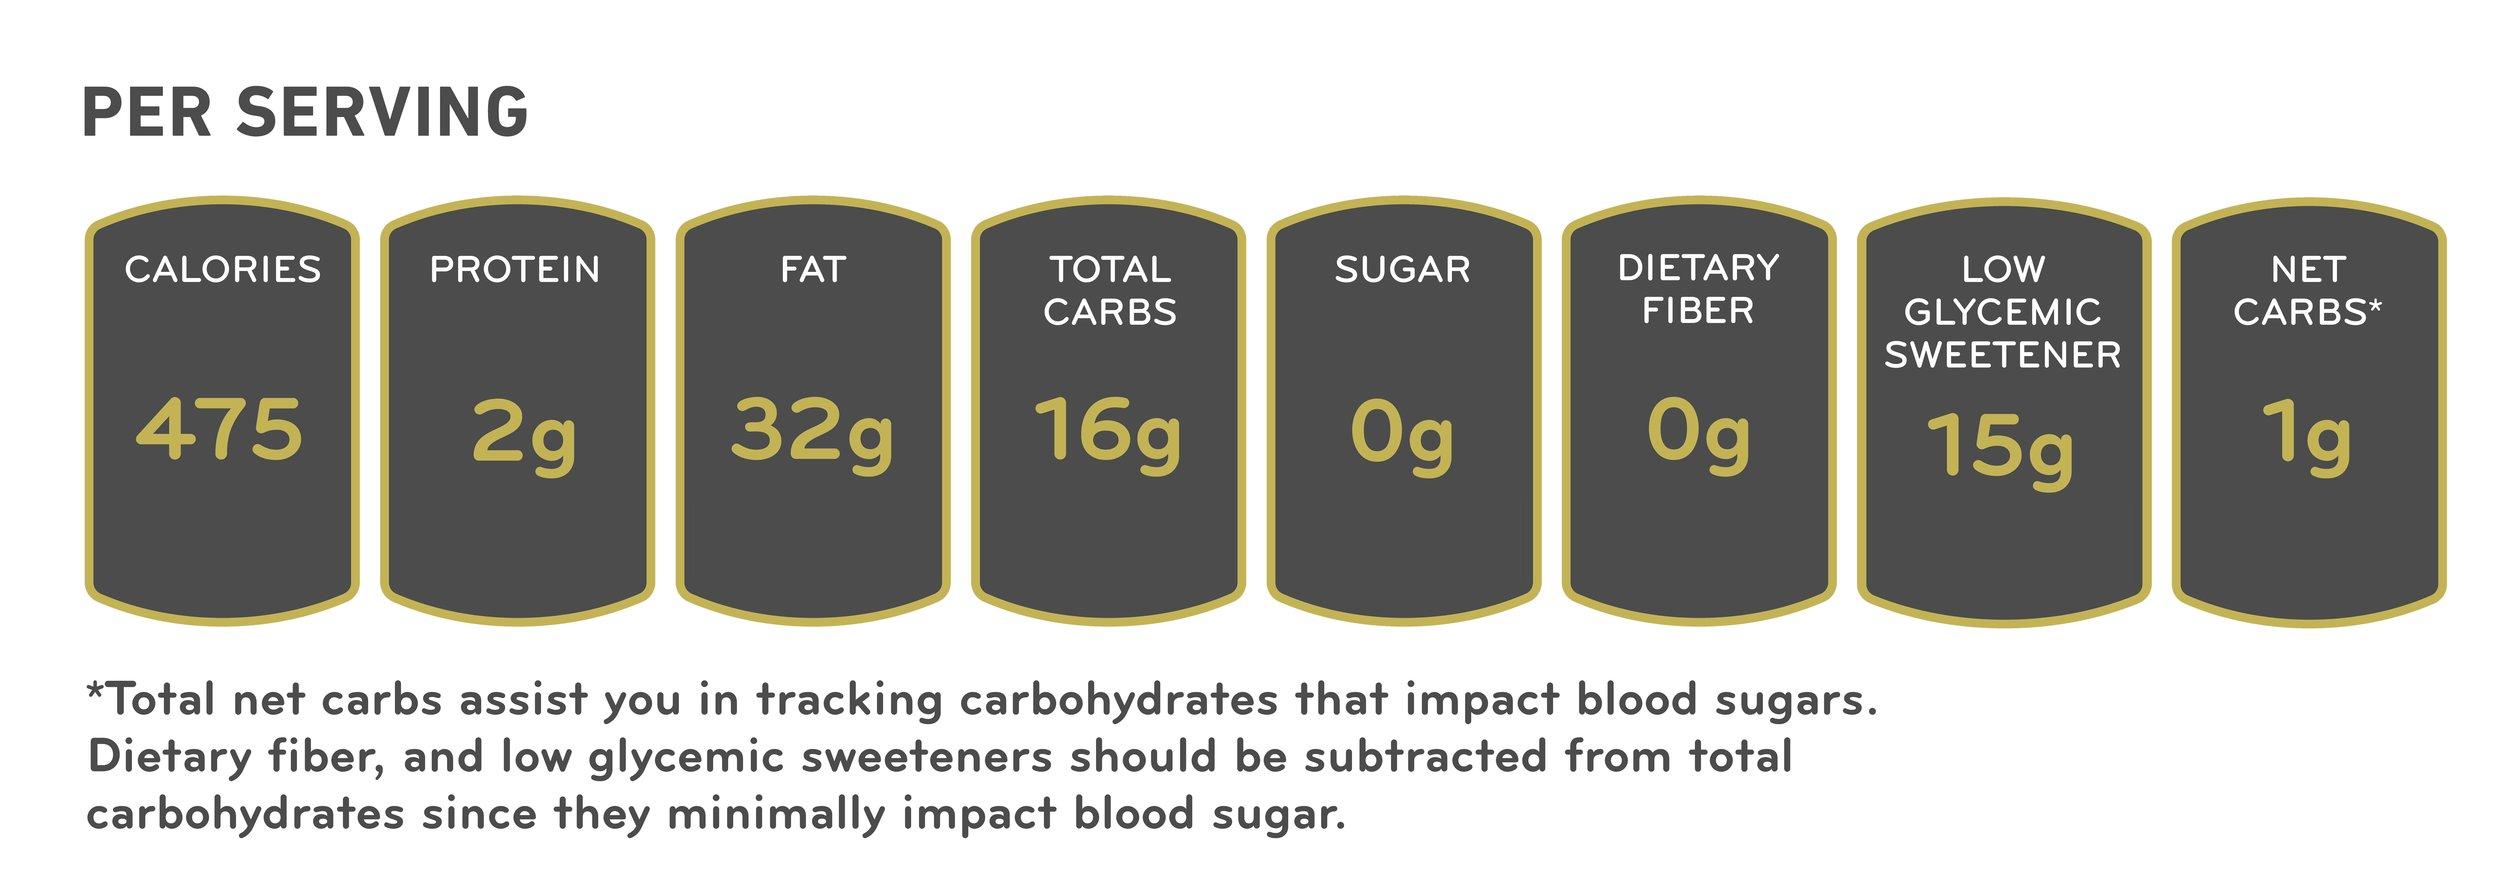 LOW-CARB KETO CHOCOLATE MARTINI NO SUGAR NUTRITION FACTS RECIPE.jpg